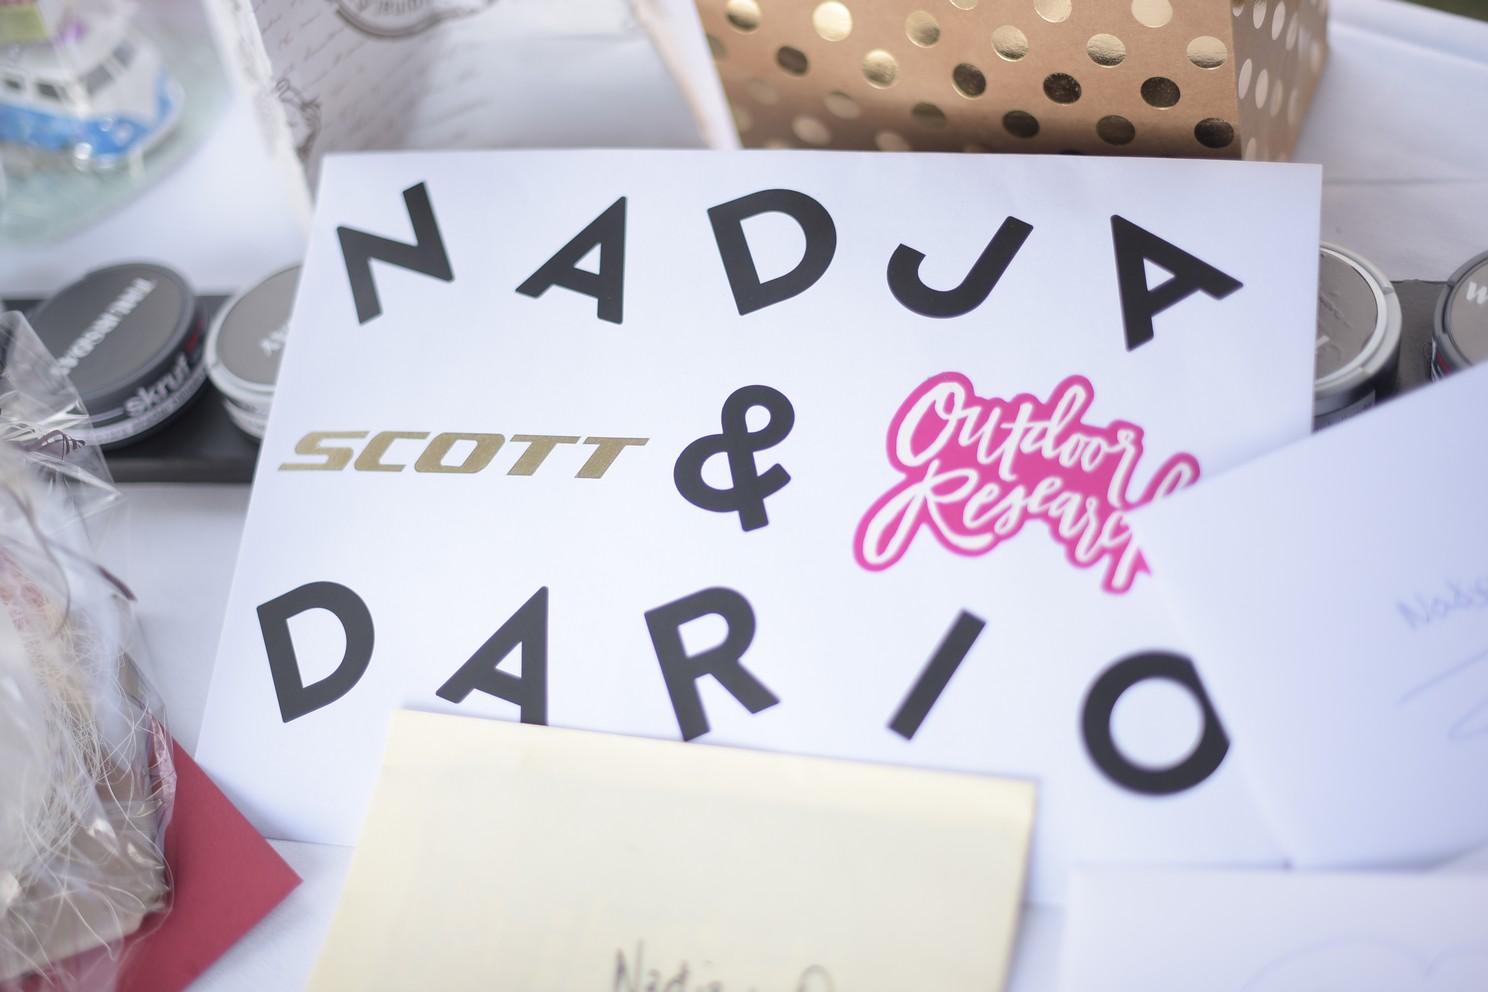 Nadja-Dario_3030s.jpg